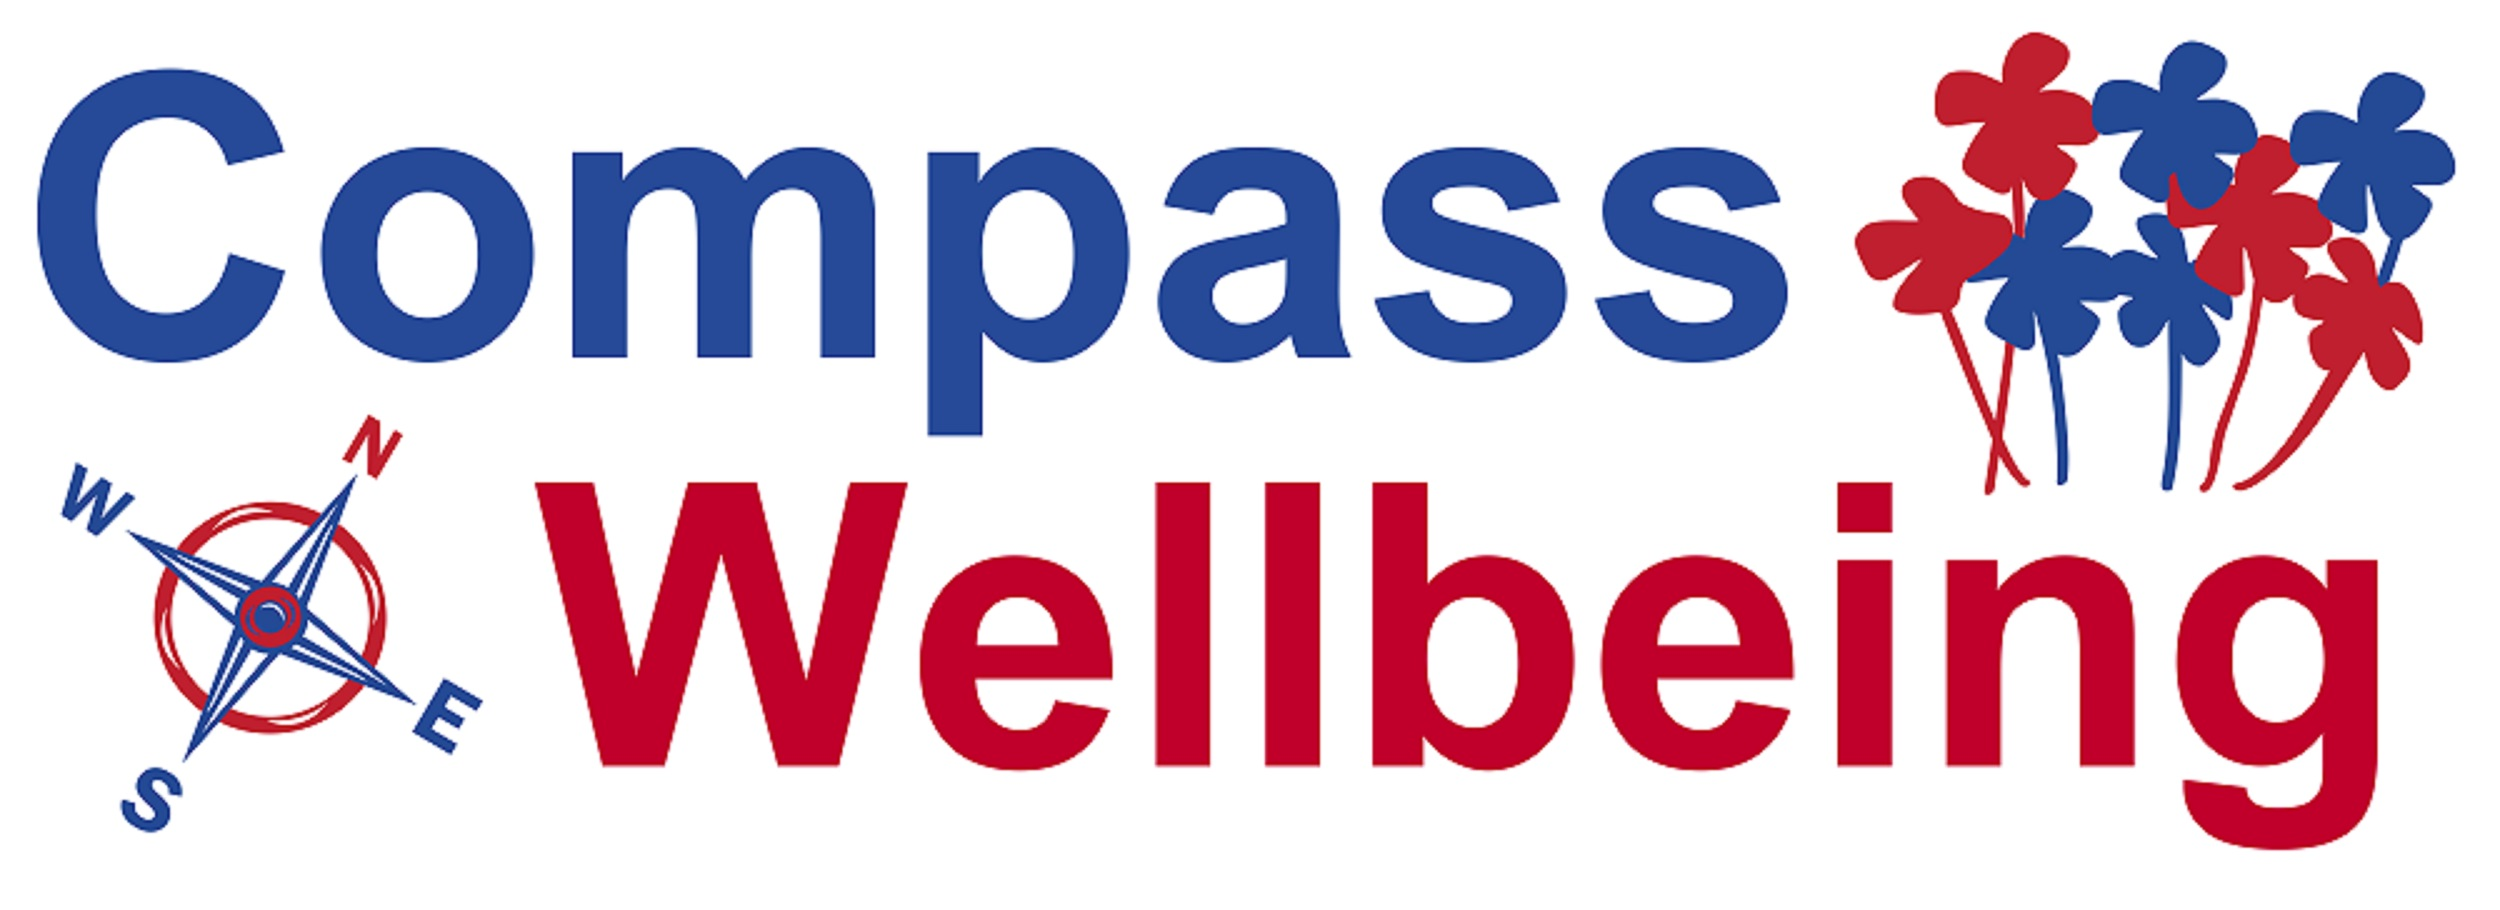 Compass Wellbeing logo